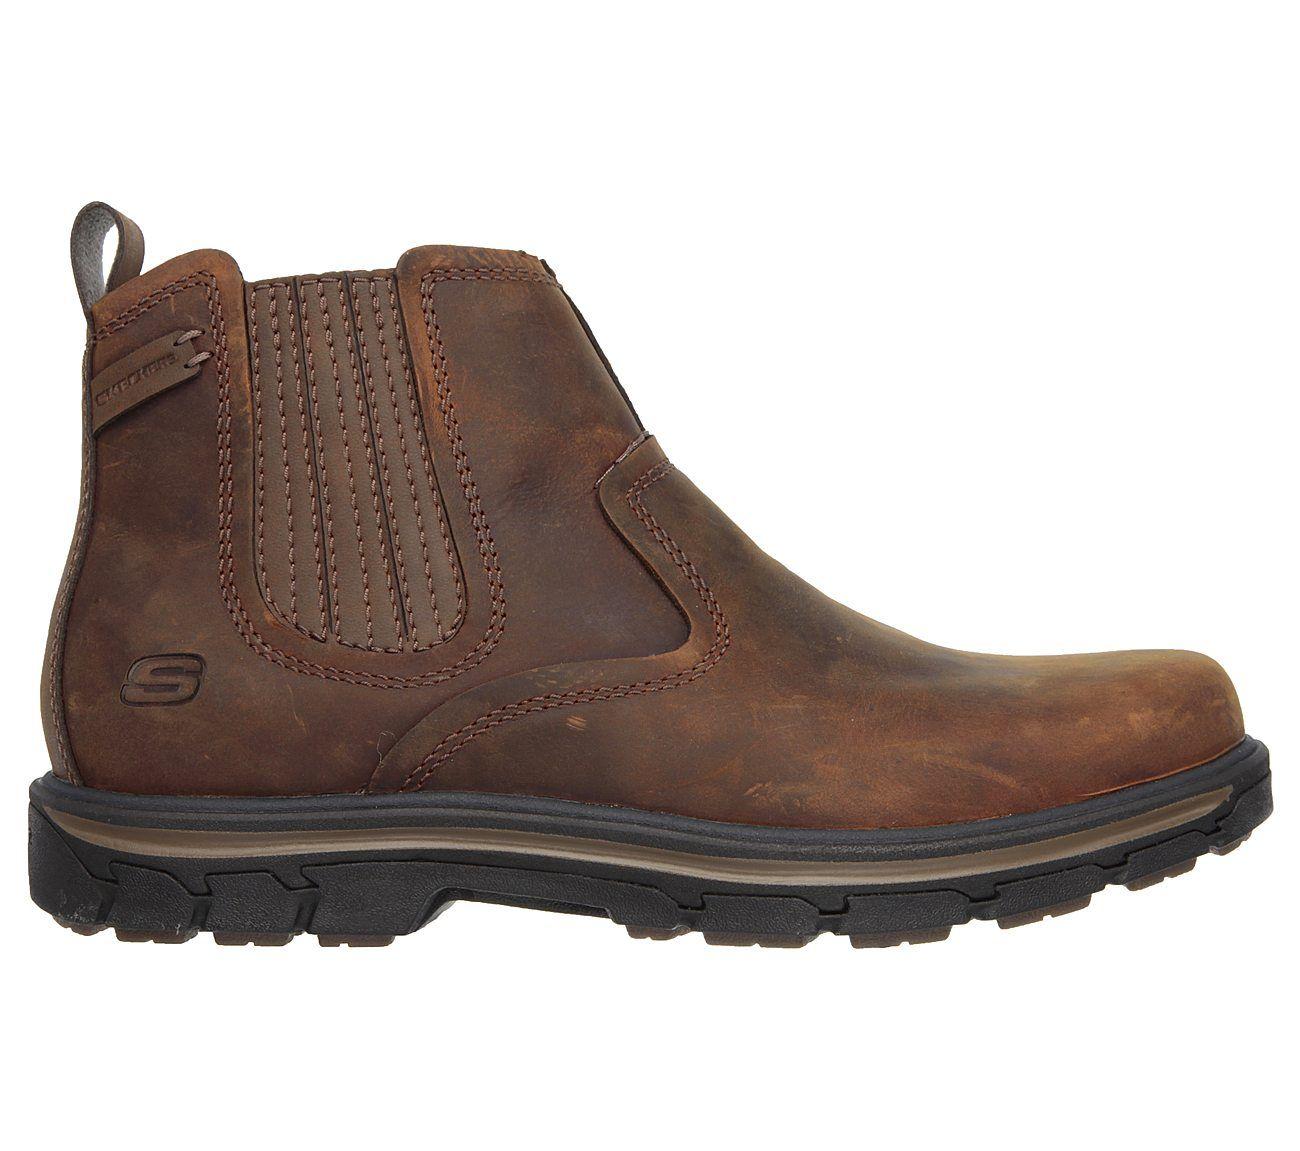 Buy Skechers Relaxed Fit Segment Dorton Skechers Relaxed Fit Shoes Zapatos Hombre Botas Zapatos Hombre Moda Zapatos Elegantes Hombre